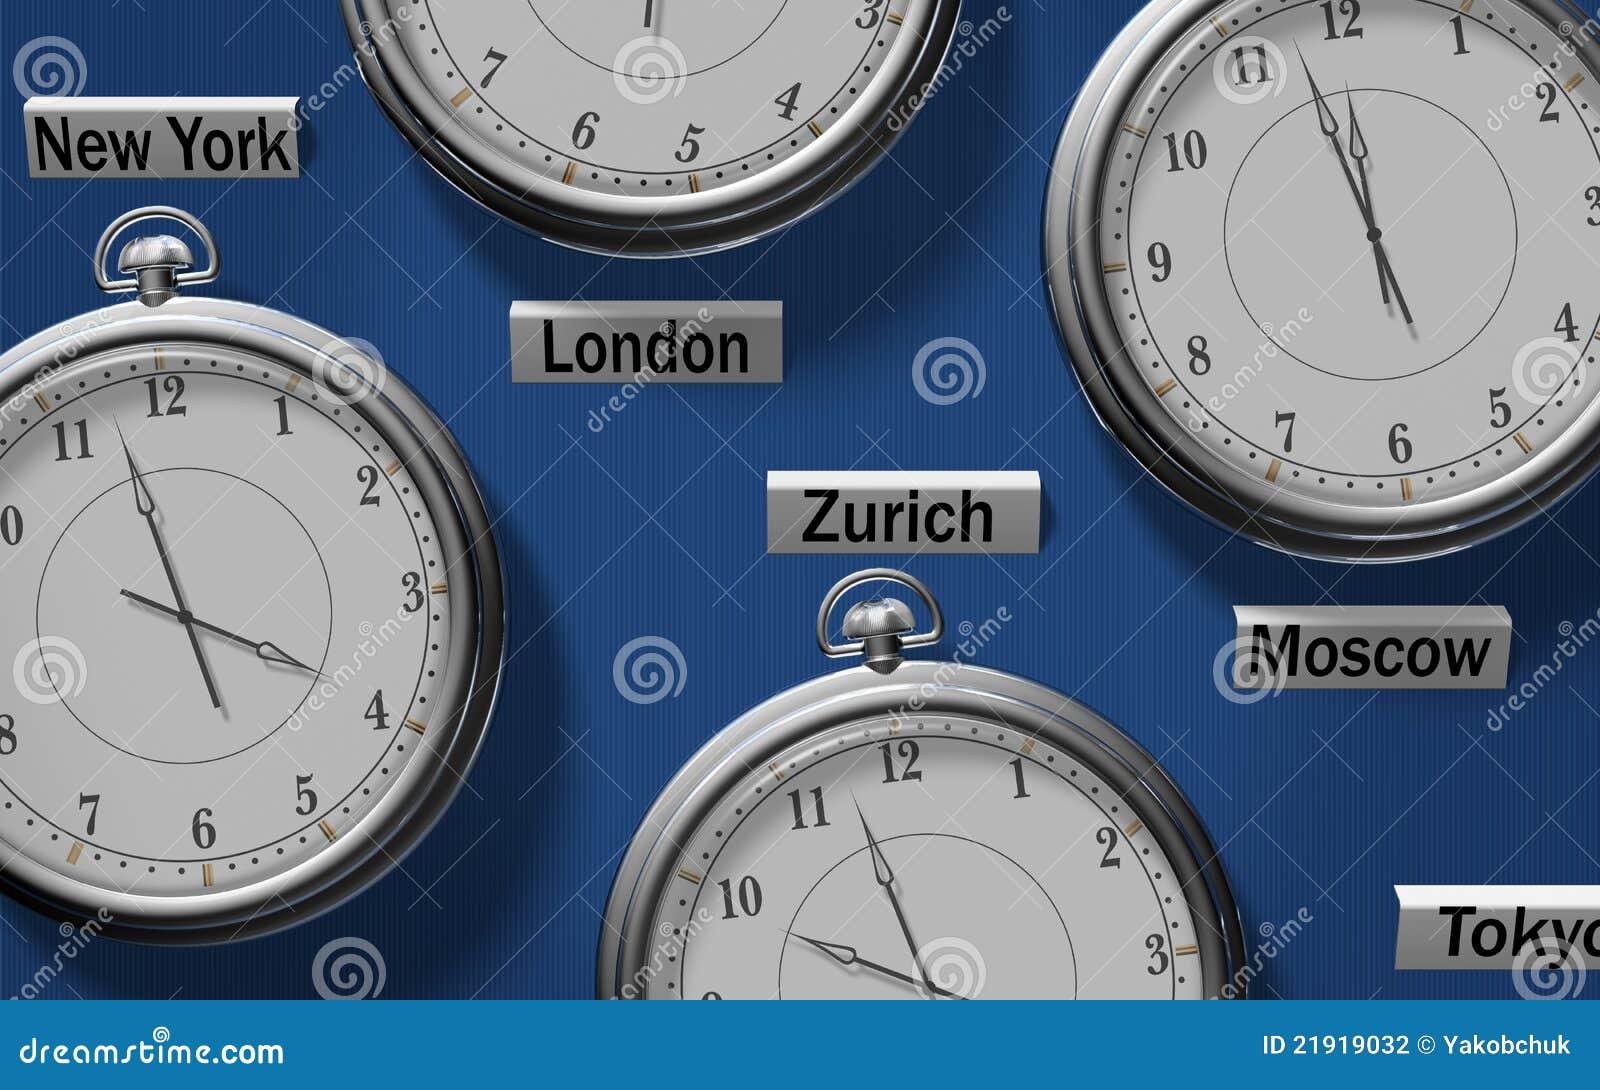 Zona horaria